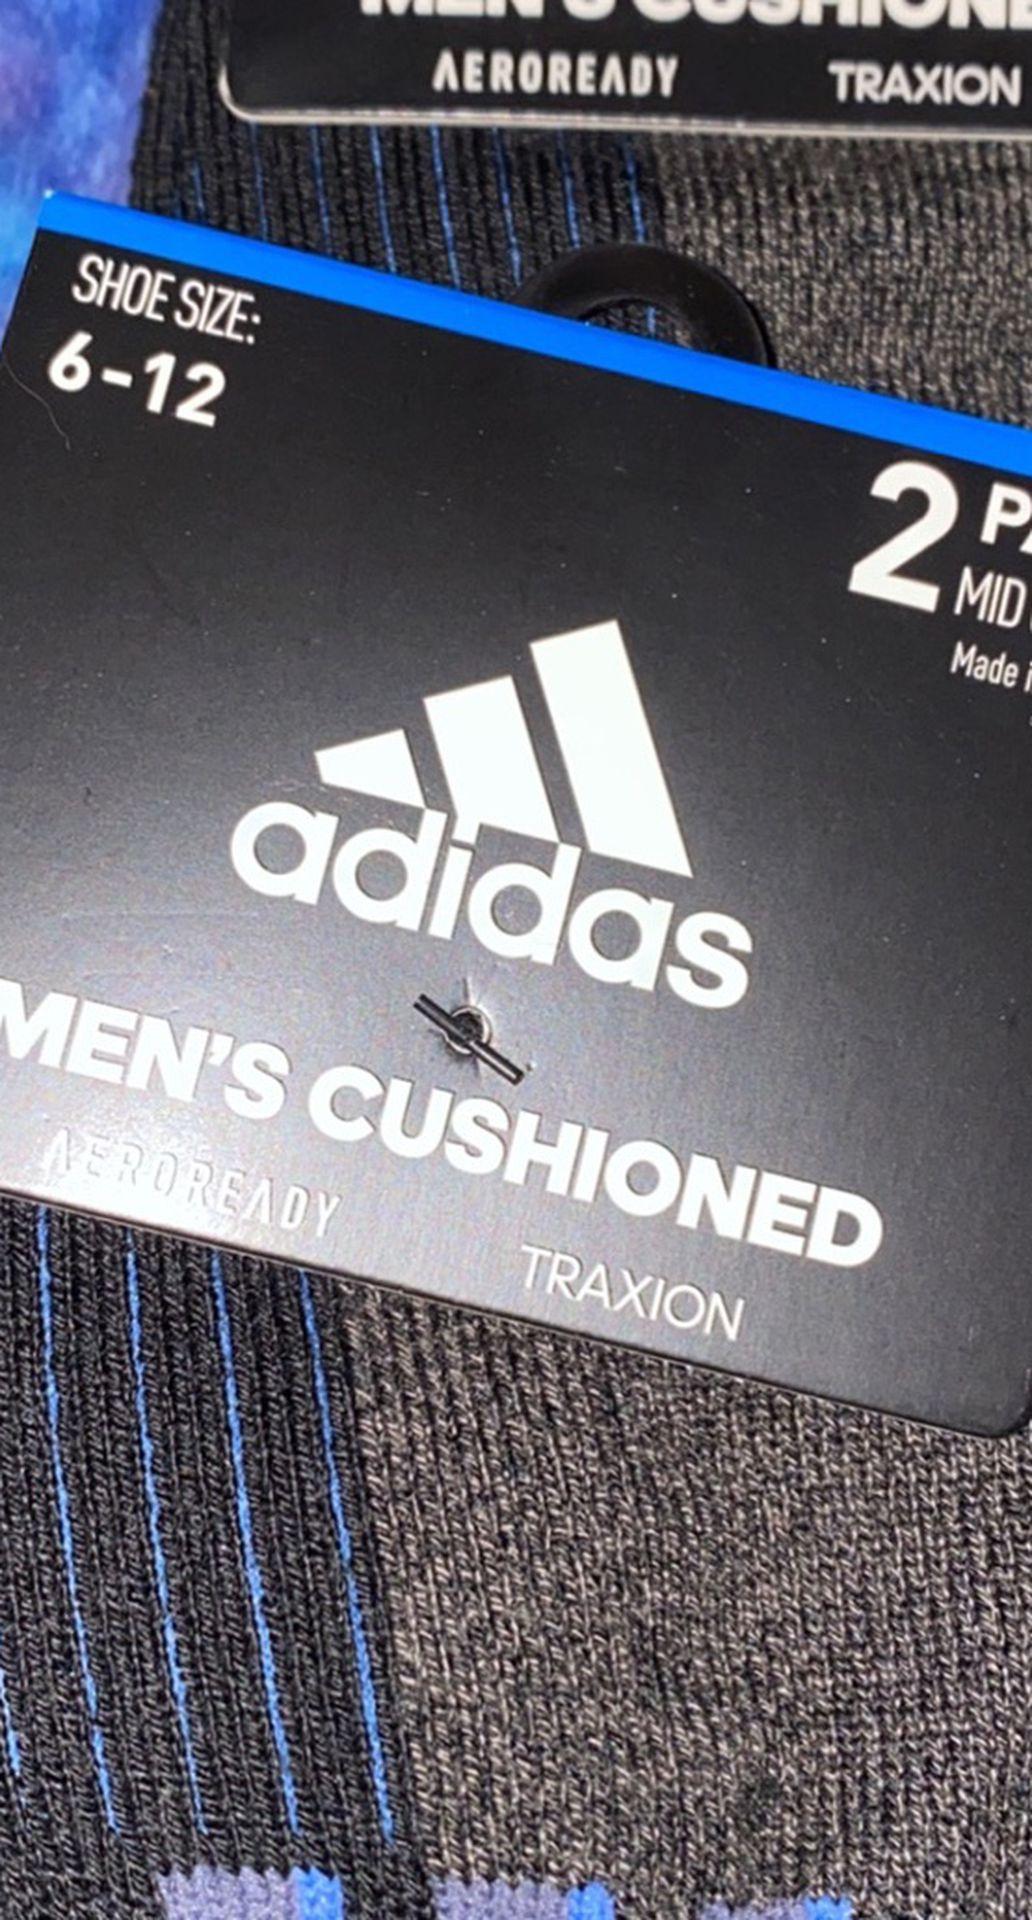 Adidas Mens Socks